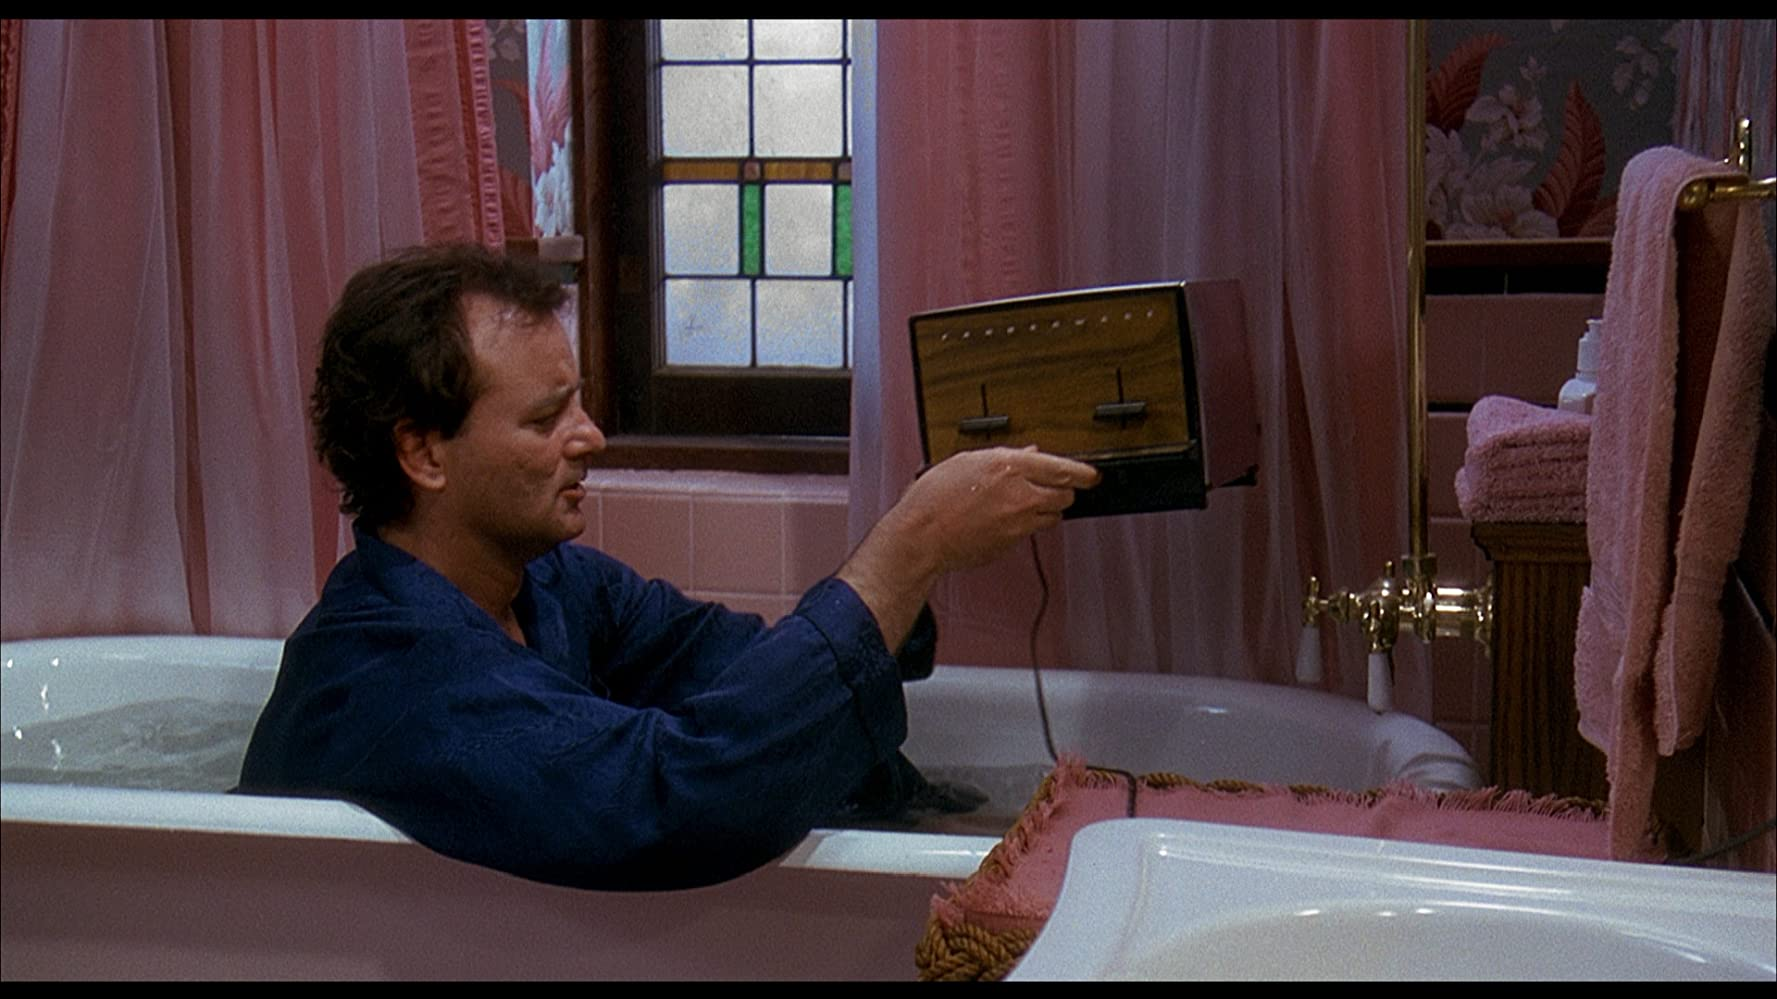 Bill Murray in Groundhog Day (1993)